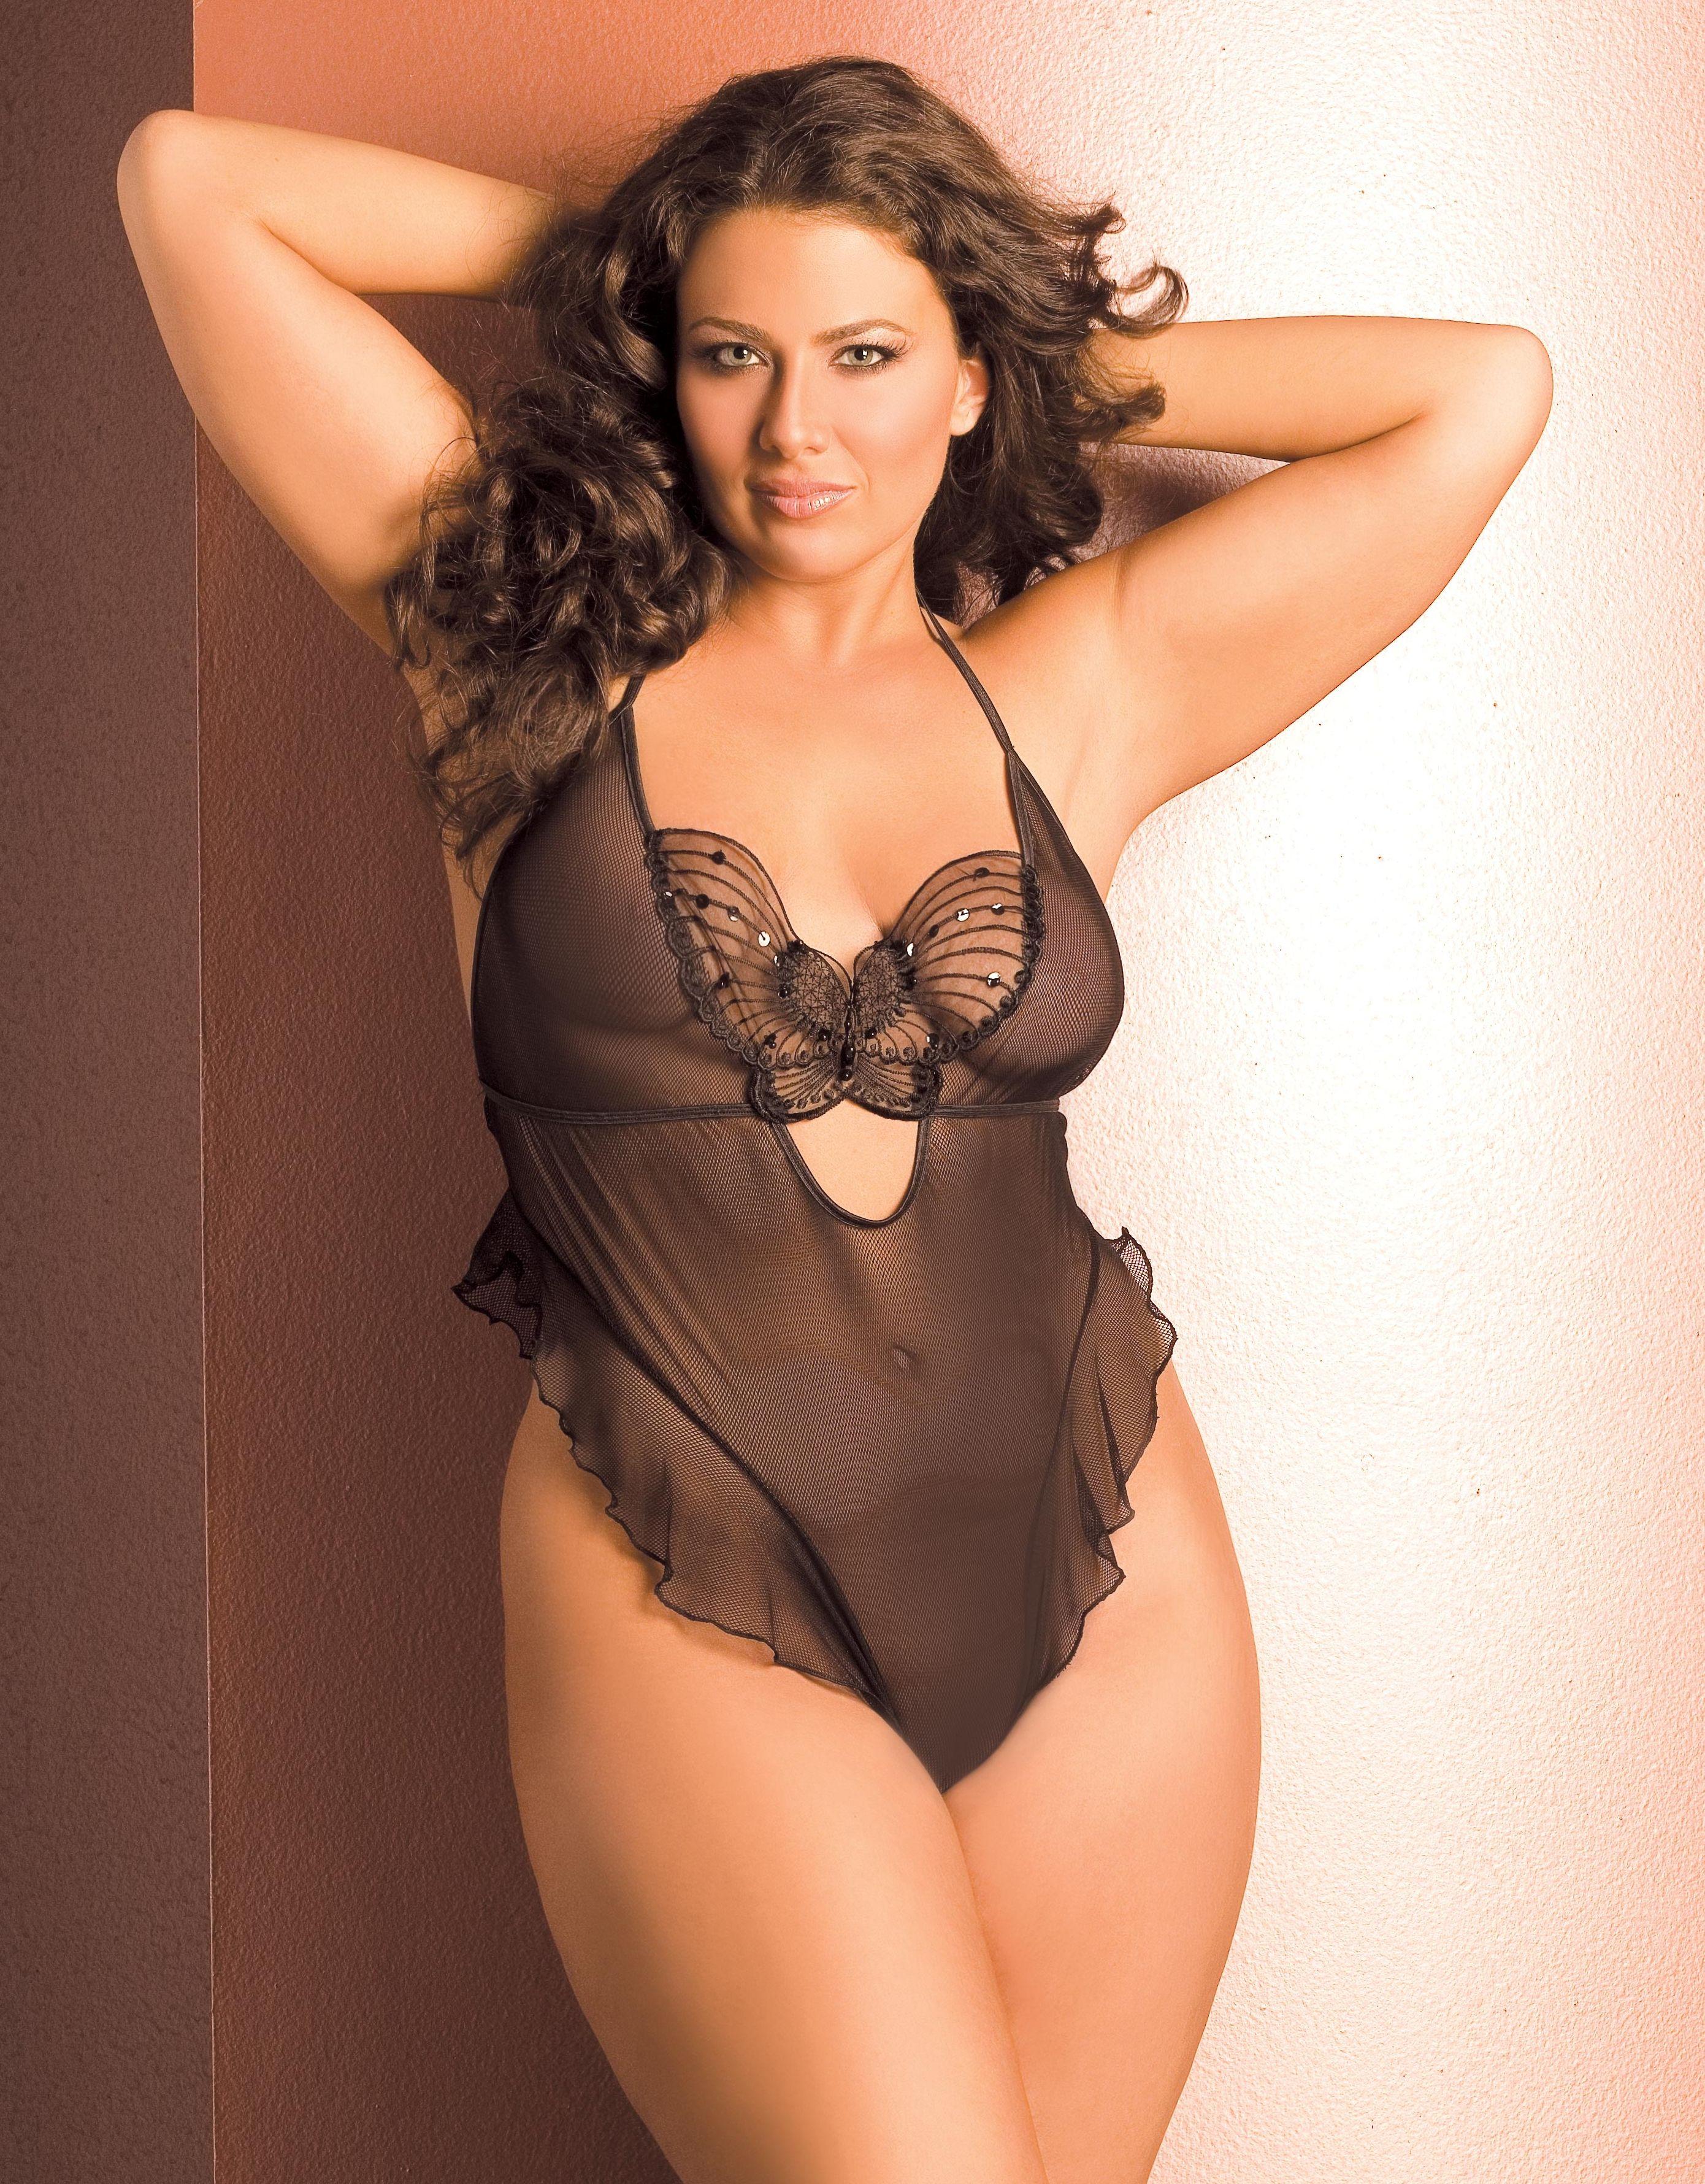 plus size model lydia fixel - vacari lingerie | body shapes